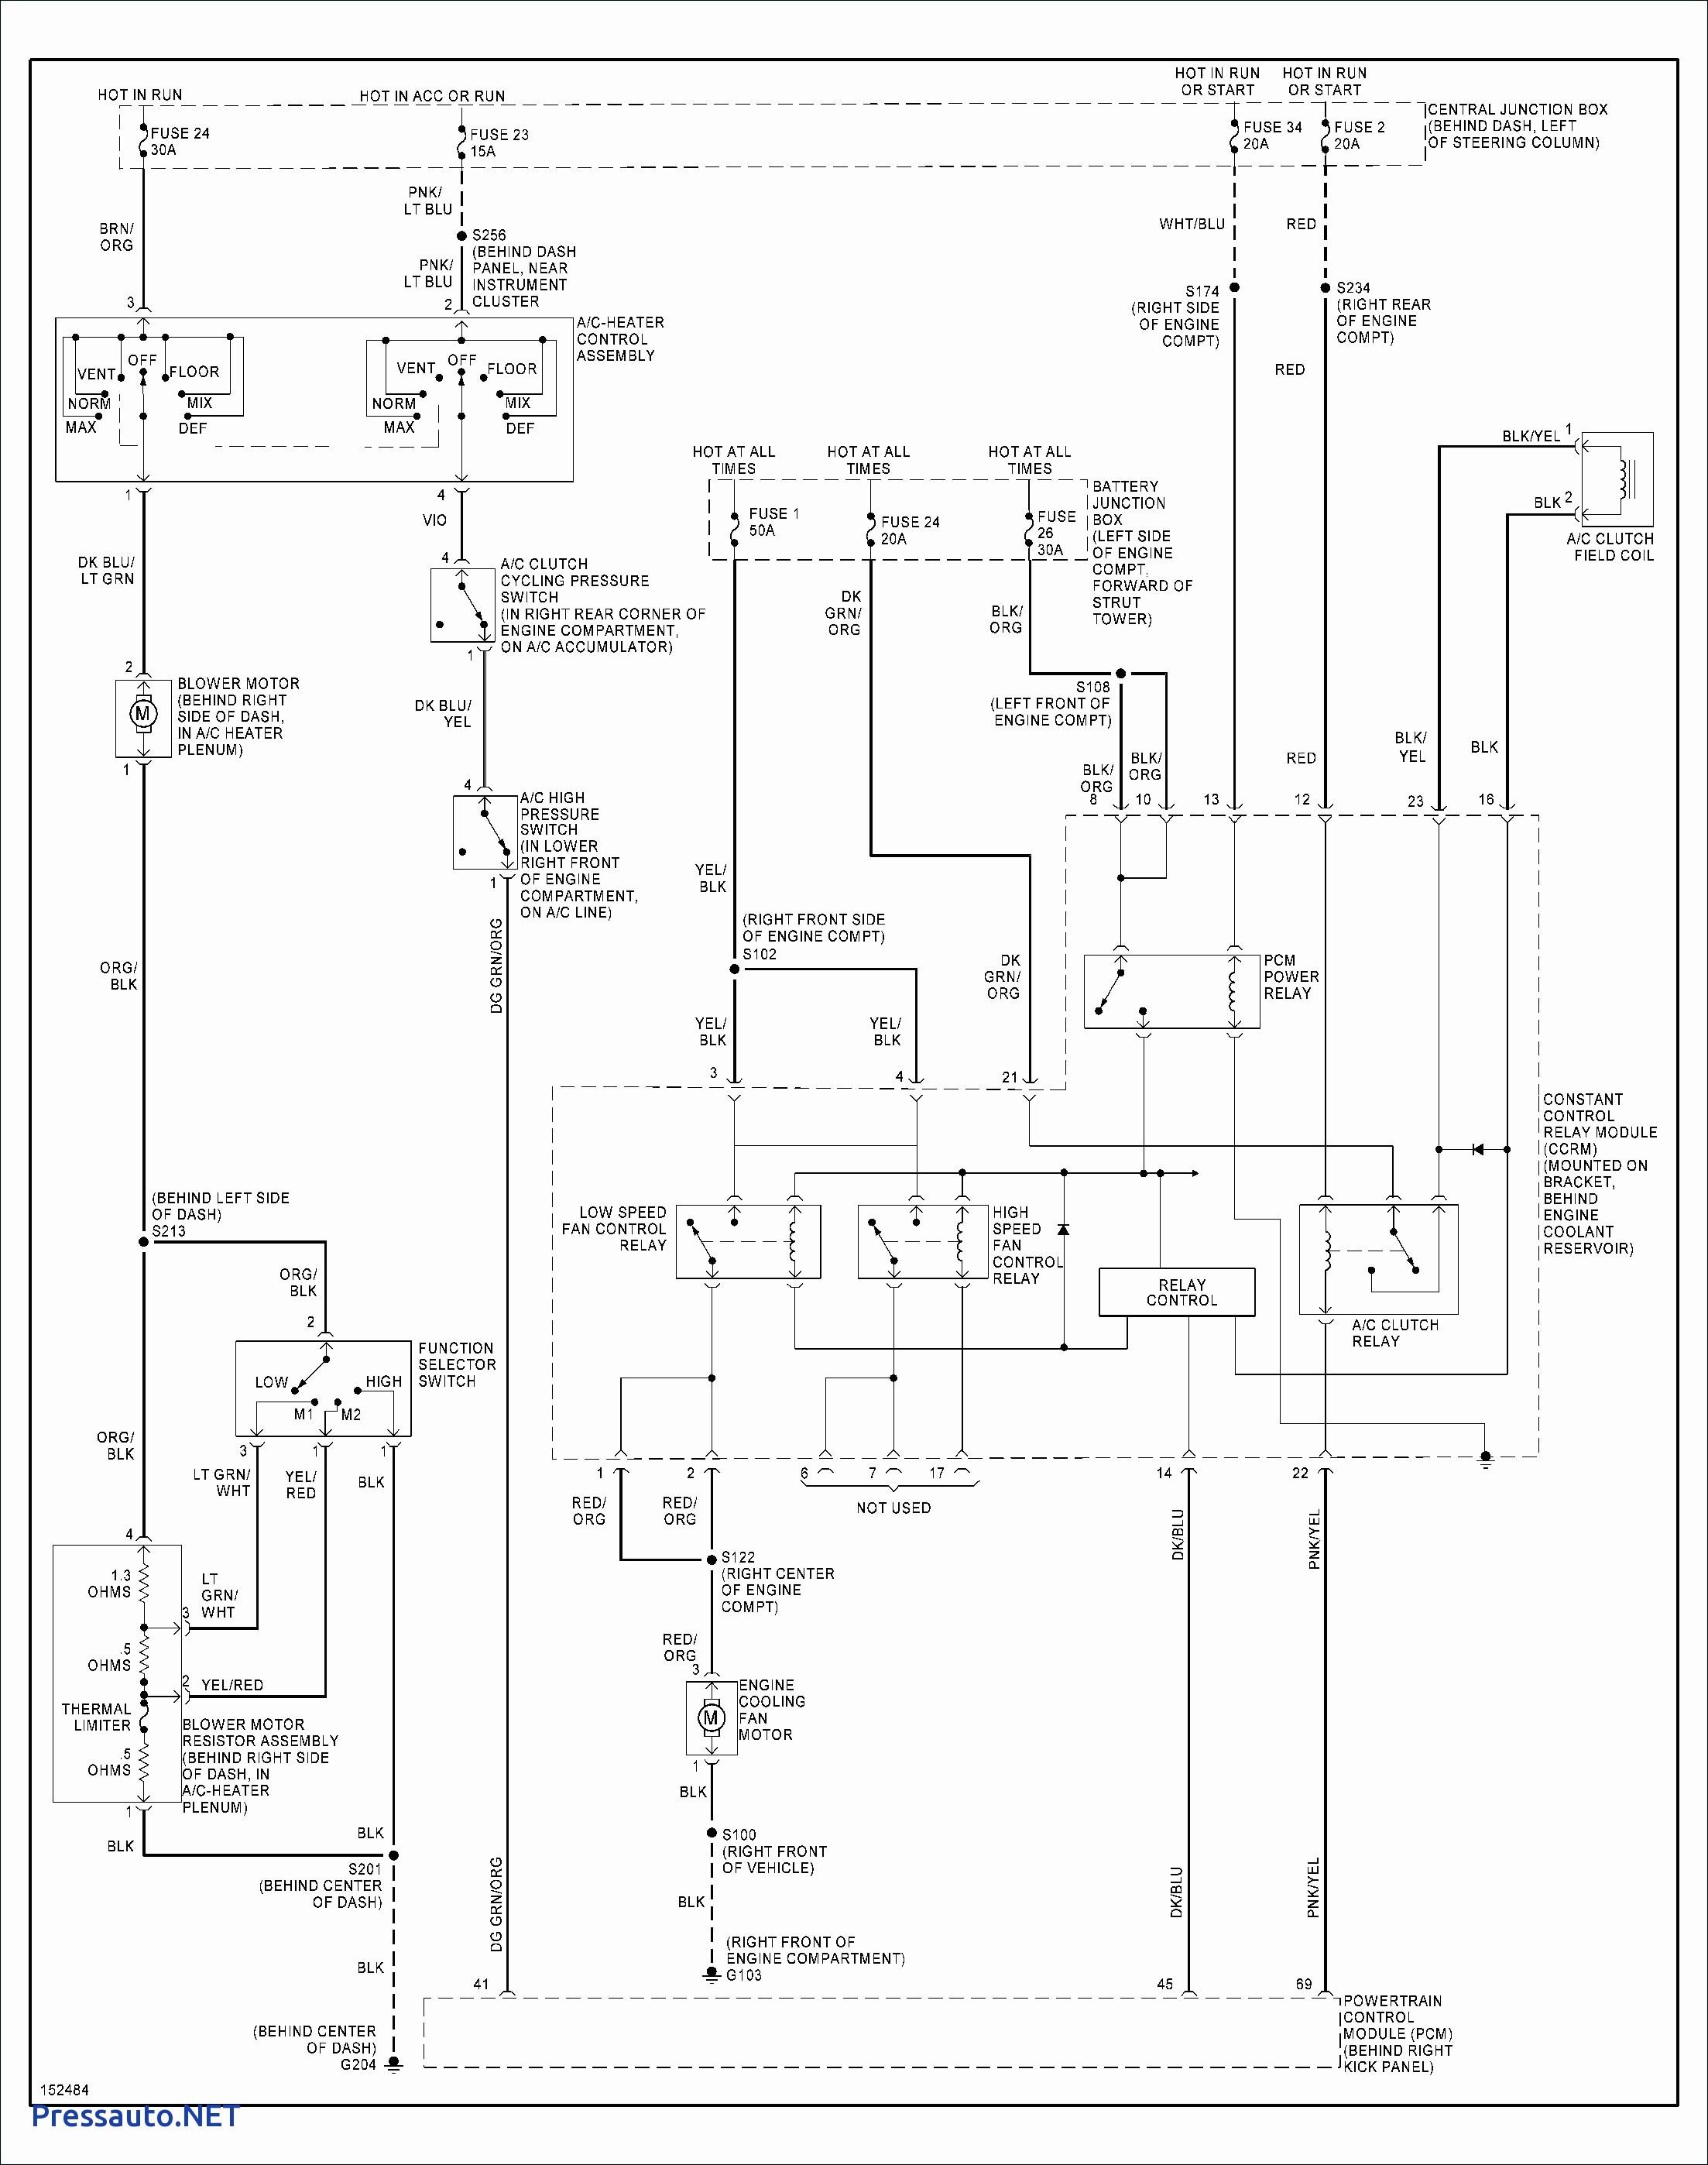 Square D Well Pump Pressure Switch Wiring Diagram - Electricity Site - Water Pump Pressure Switch Wiring Diagram